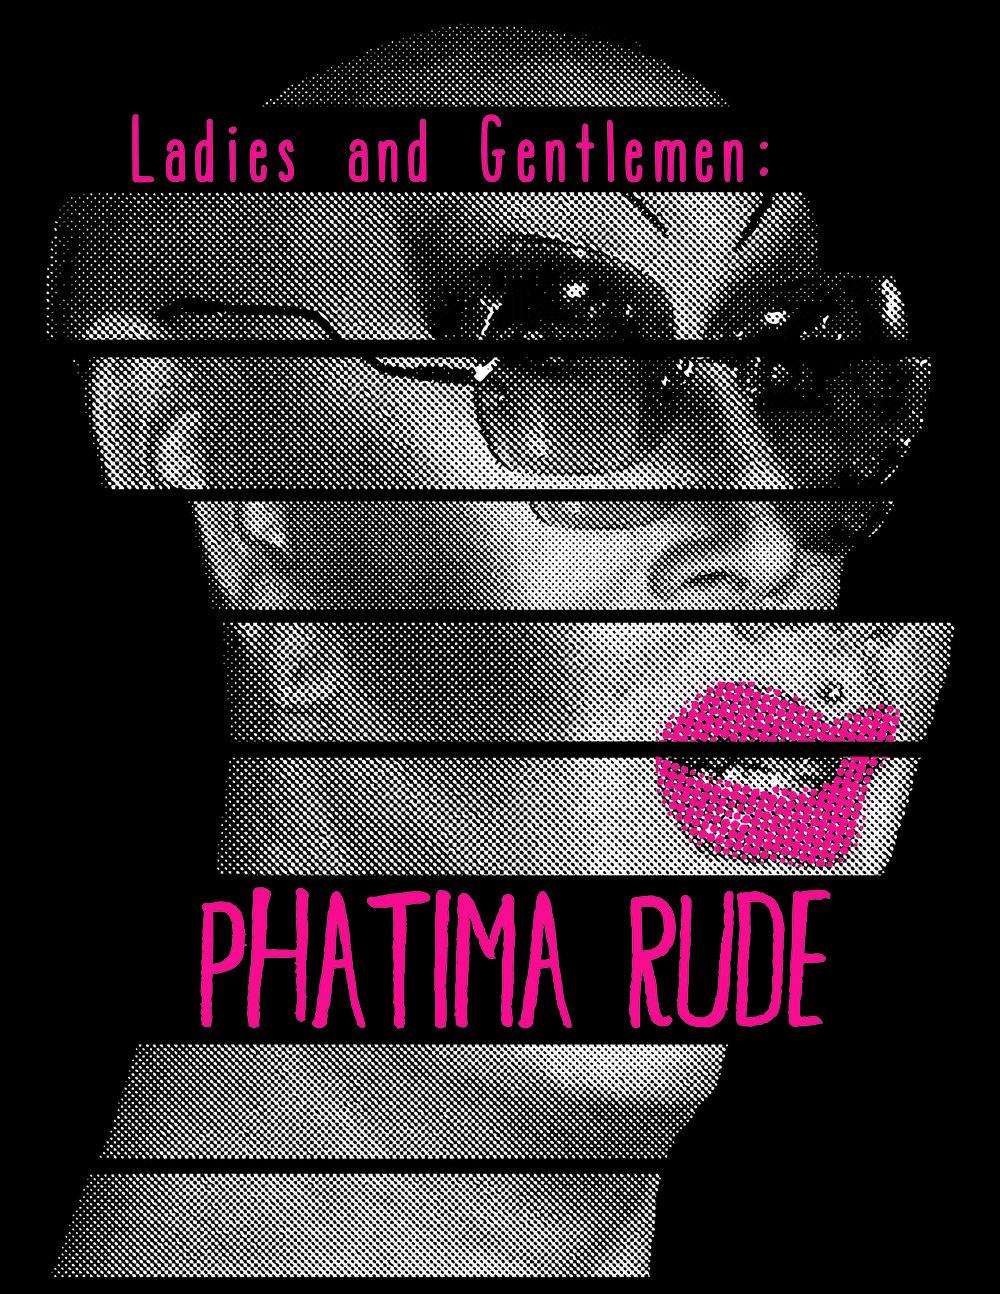 phatima rude shirt_complete_2.jpg